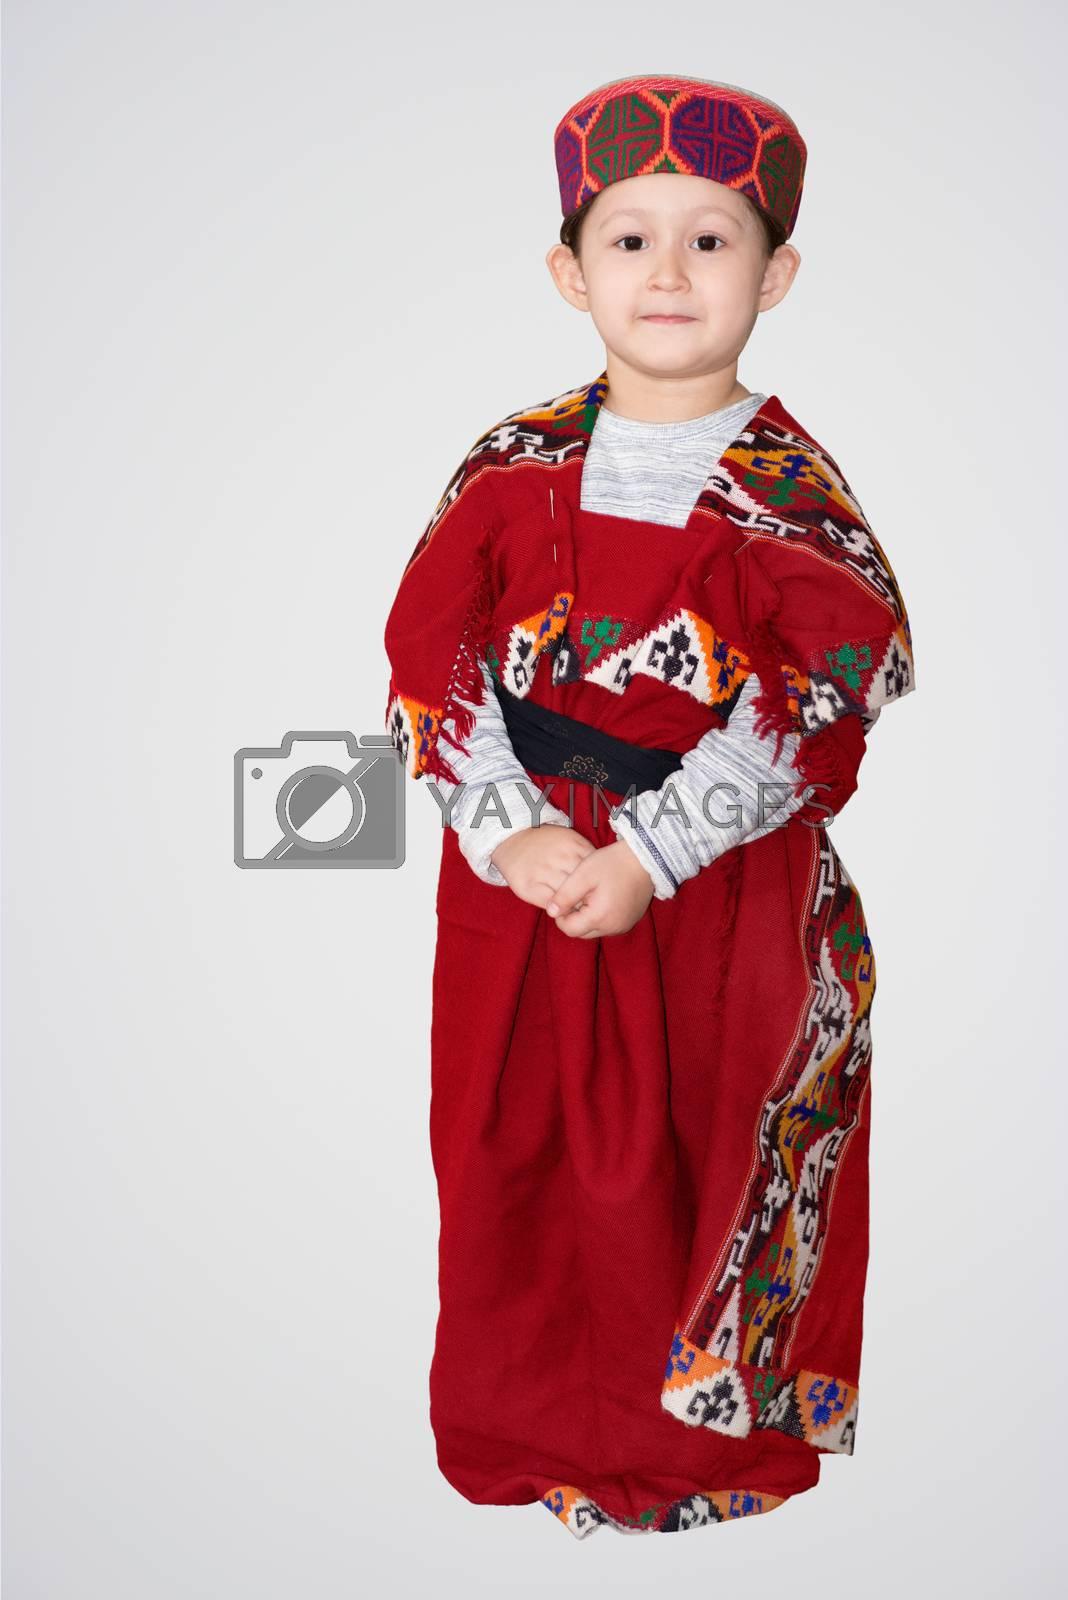 Cute little girl in Himachali traditional dress, Shimla, Himachal Pradesh.